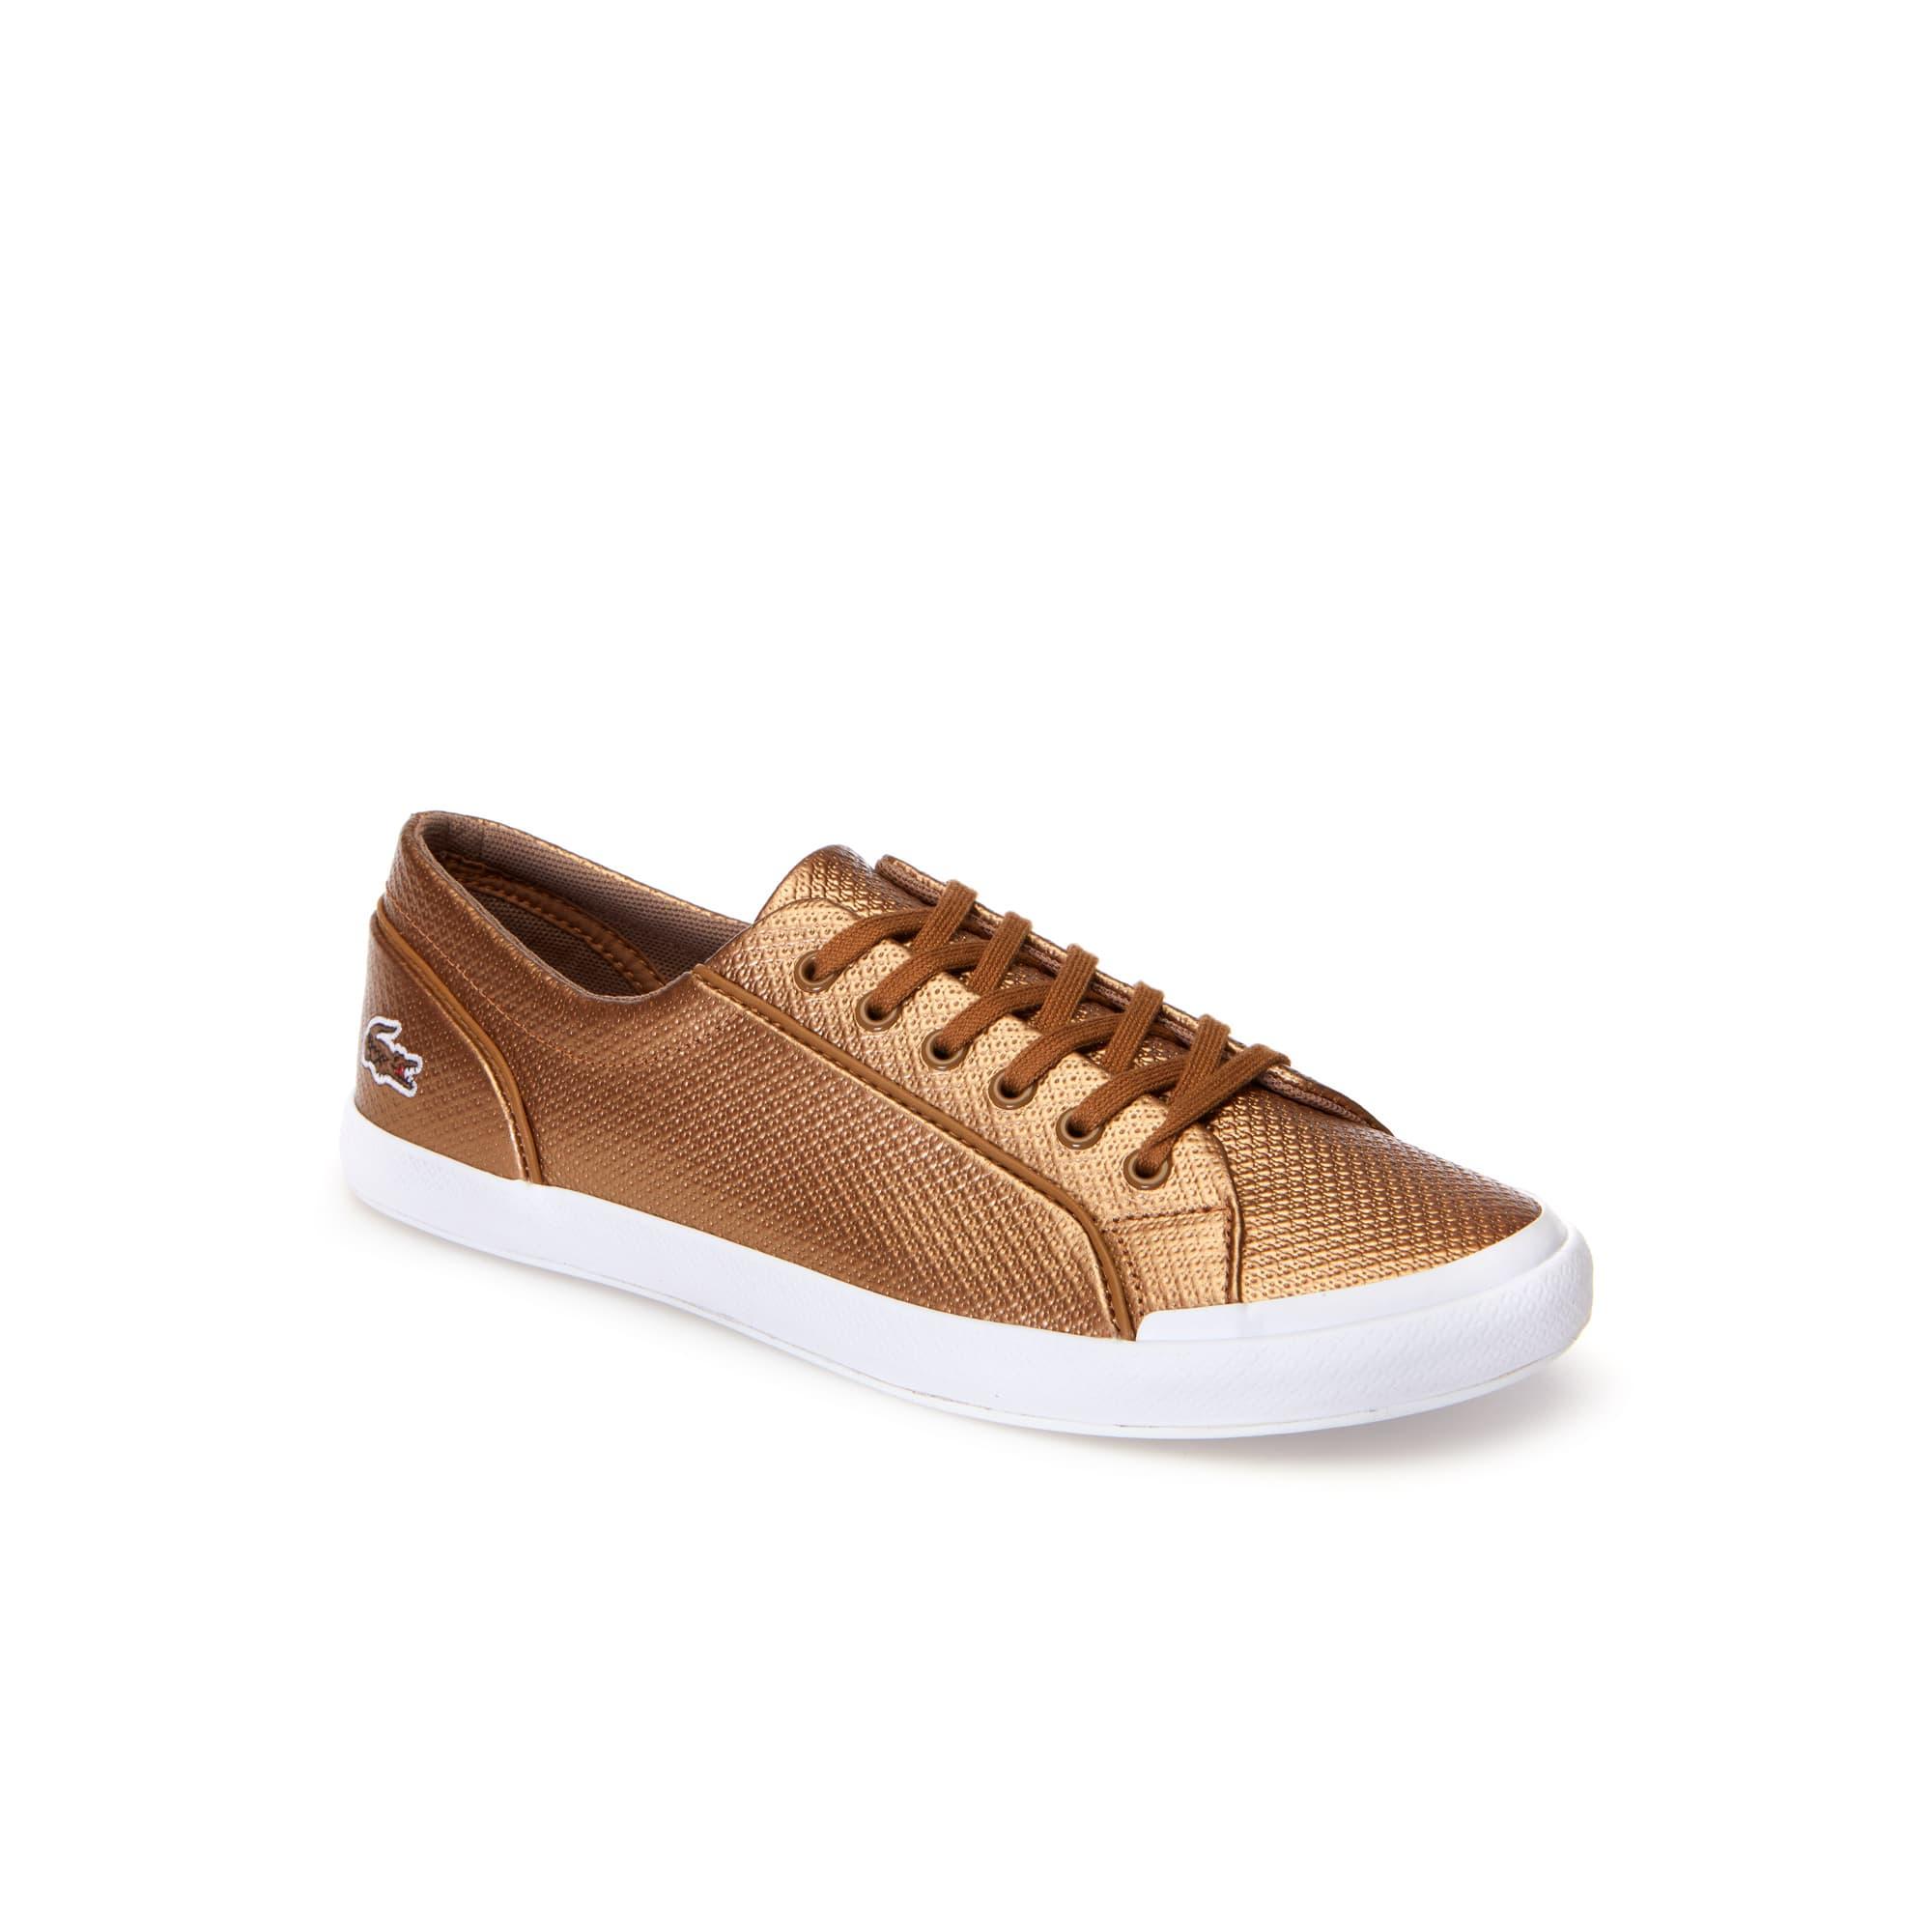 Sneakers Lancelle Bronze femme Chantaco en cuir